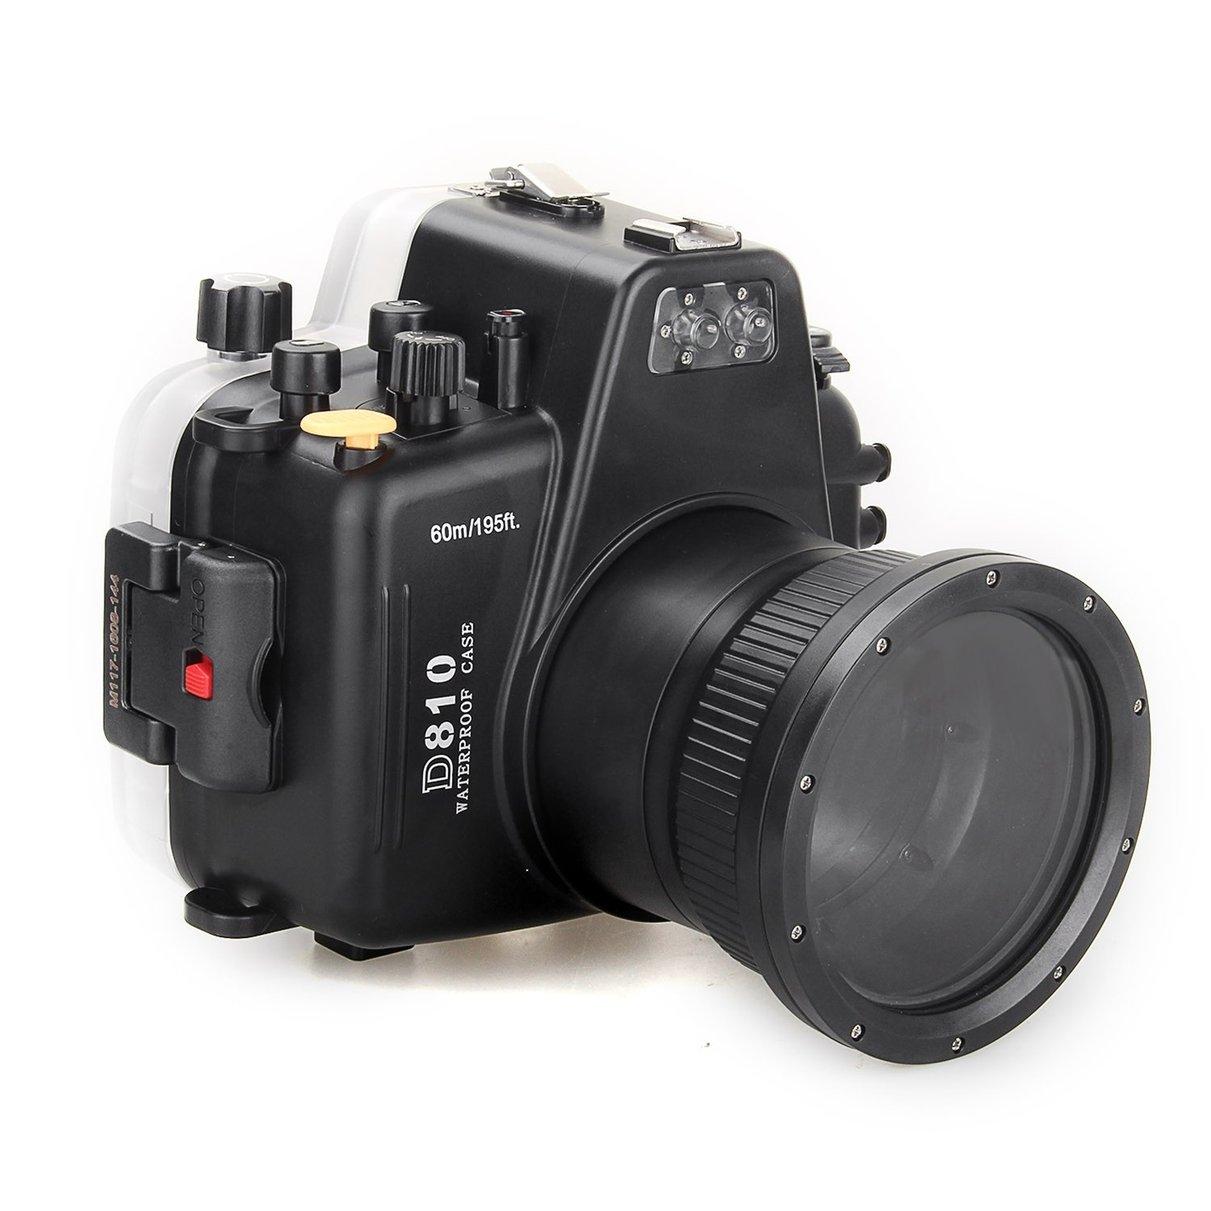 Free ship DHL Meikon 60m195ft Waterproof Underwater Camera Housing Case Diving Equipment for Nikon D810